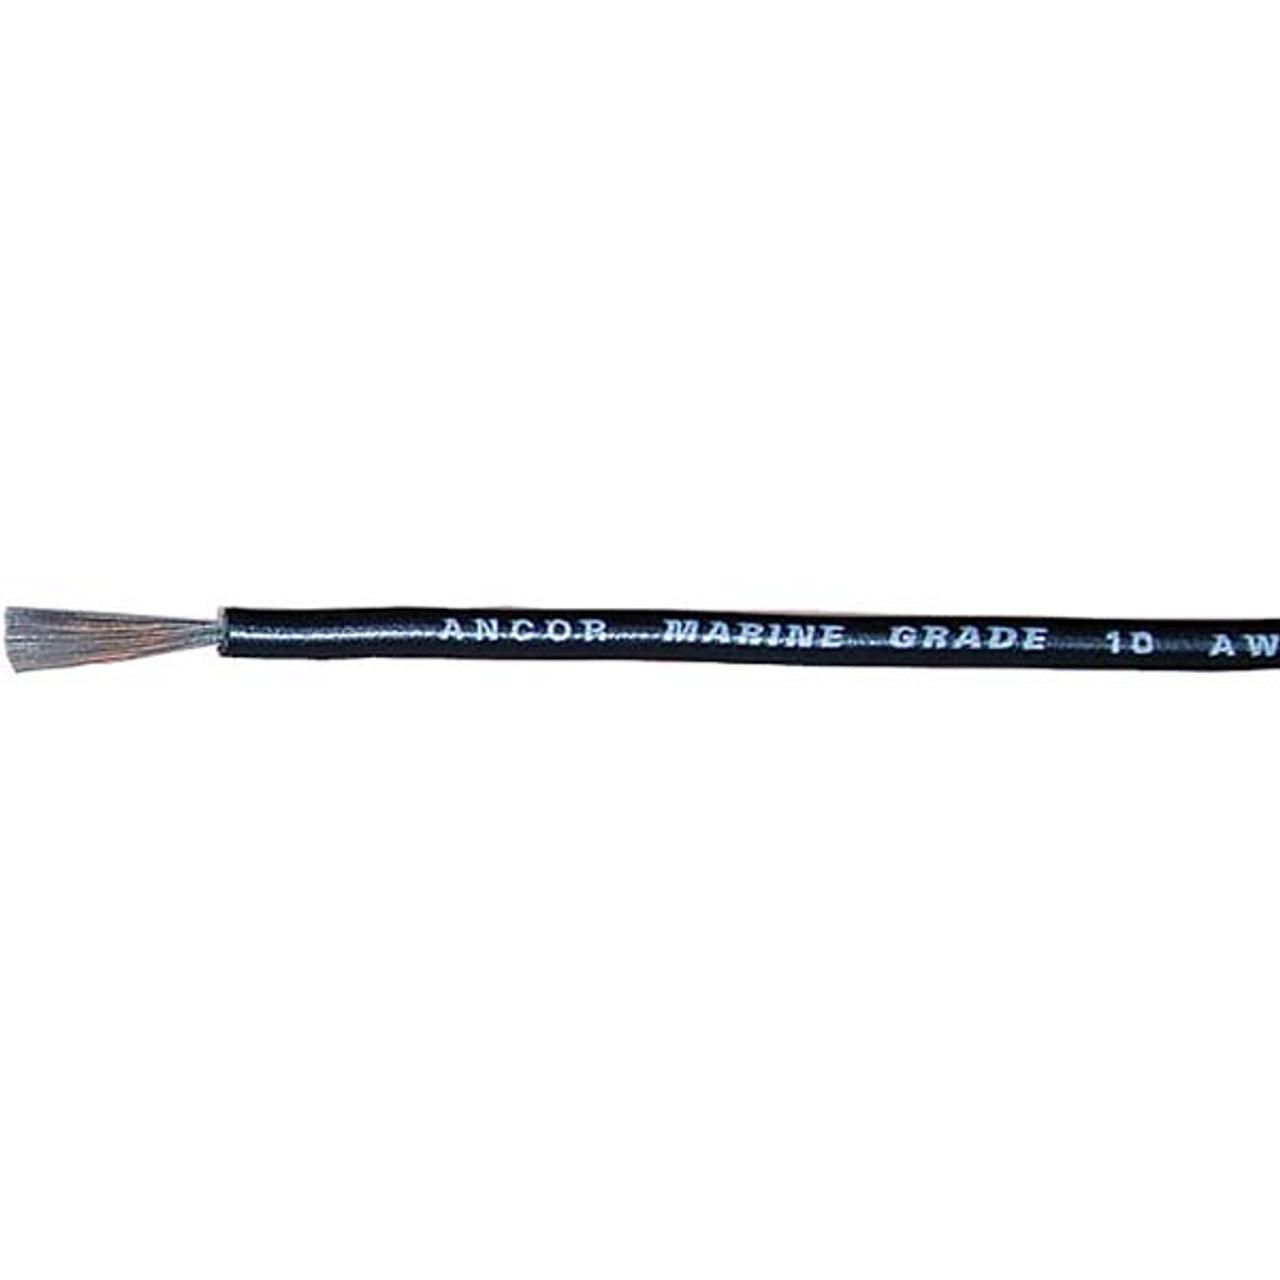 50 Foot Reel 10 Gauge Tinned Marine Primary Wire White